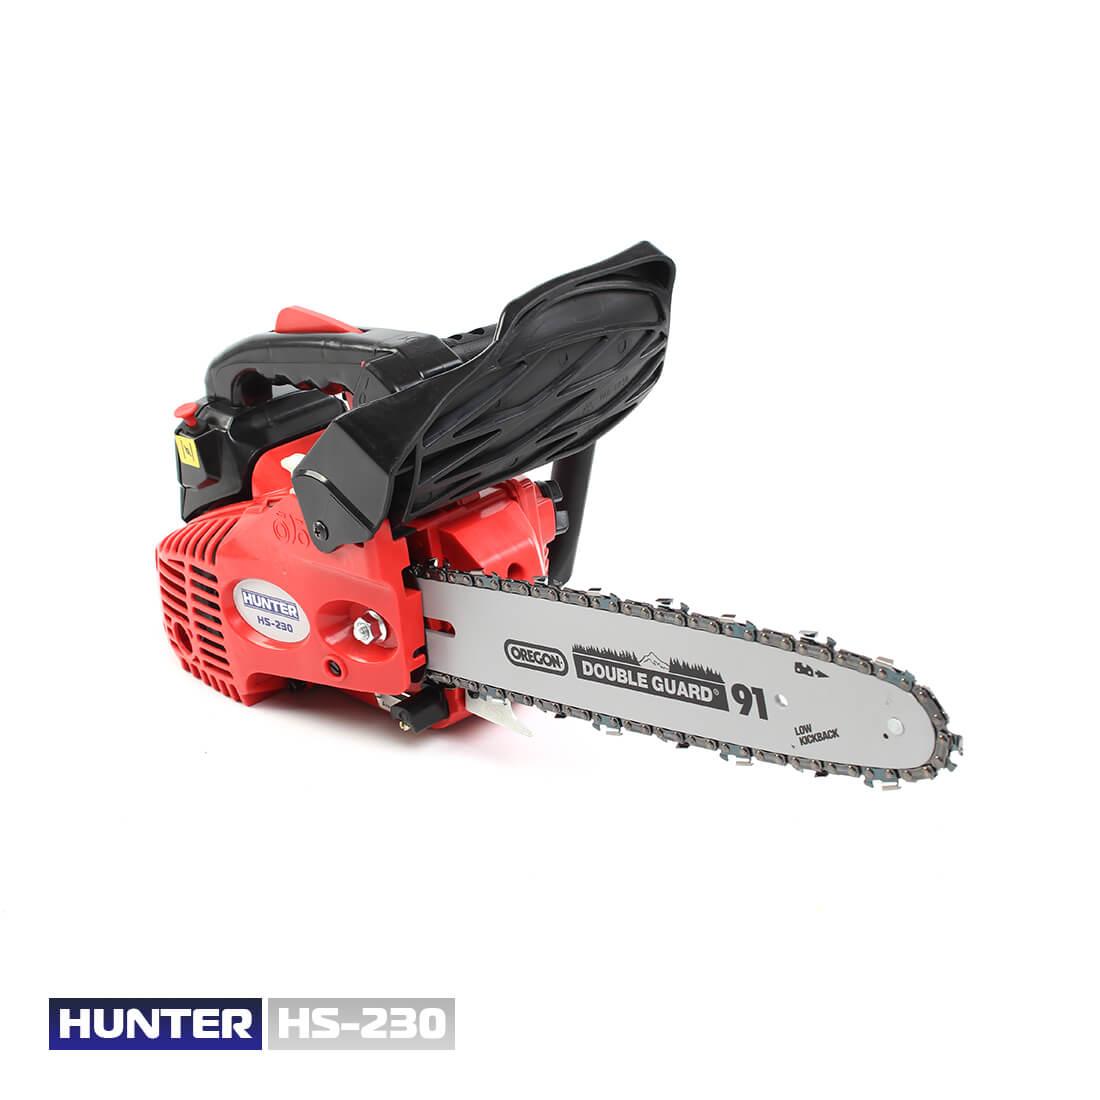 Фото Hunter HS-230 цена 3470грн №4 — Hunter